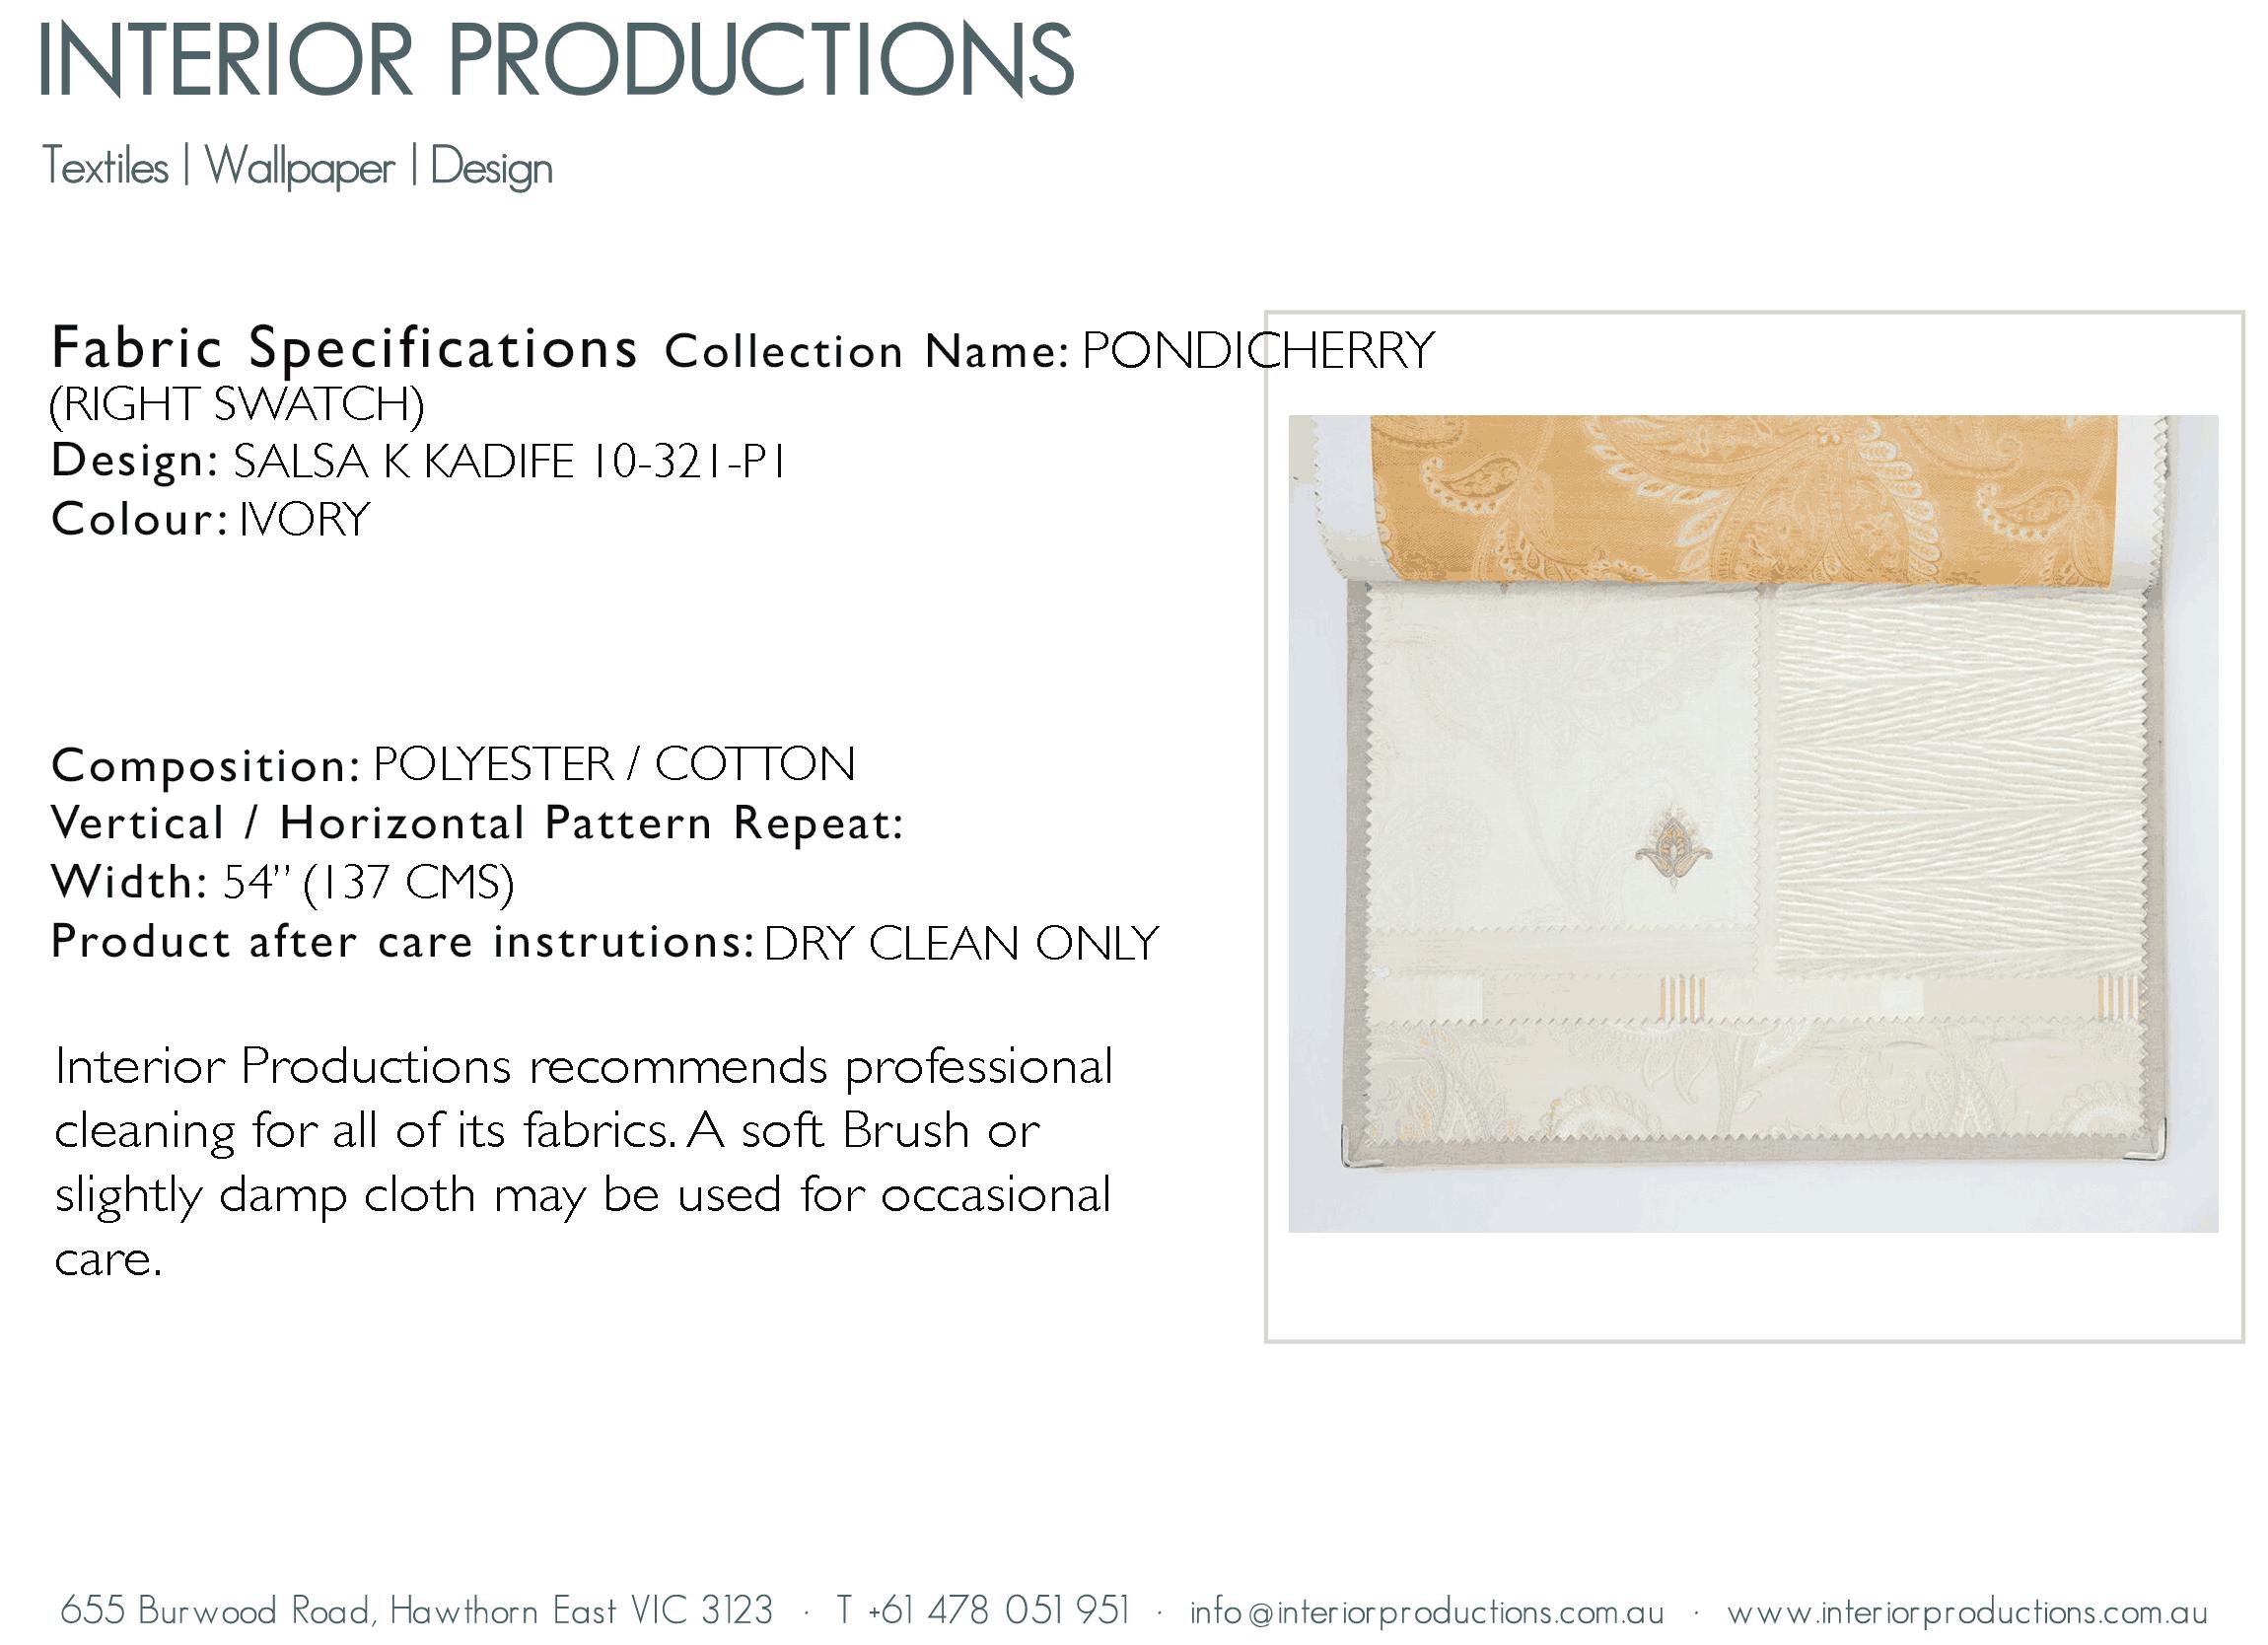 interior_productions_SALSA-K-KADIFE-10-321-P1---IVORY